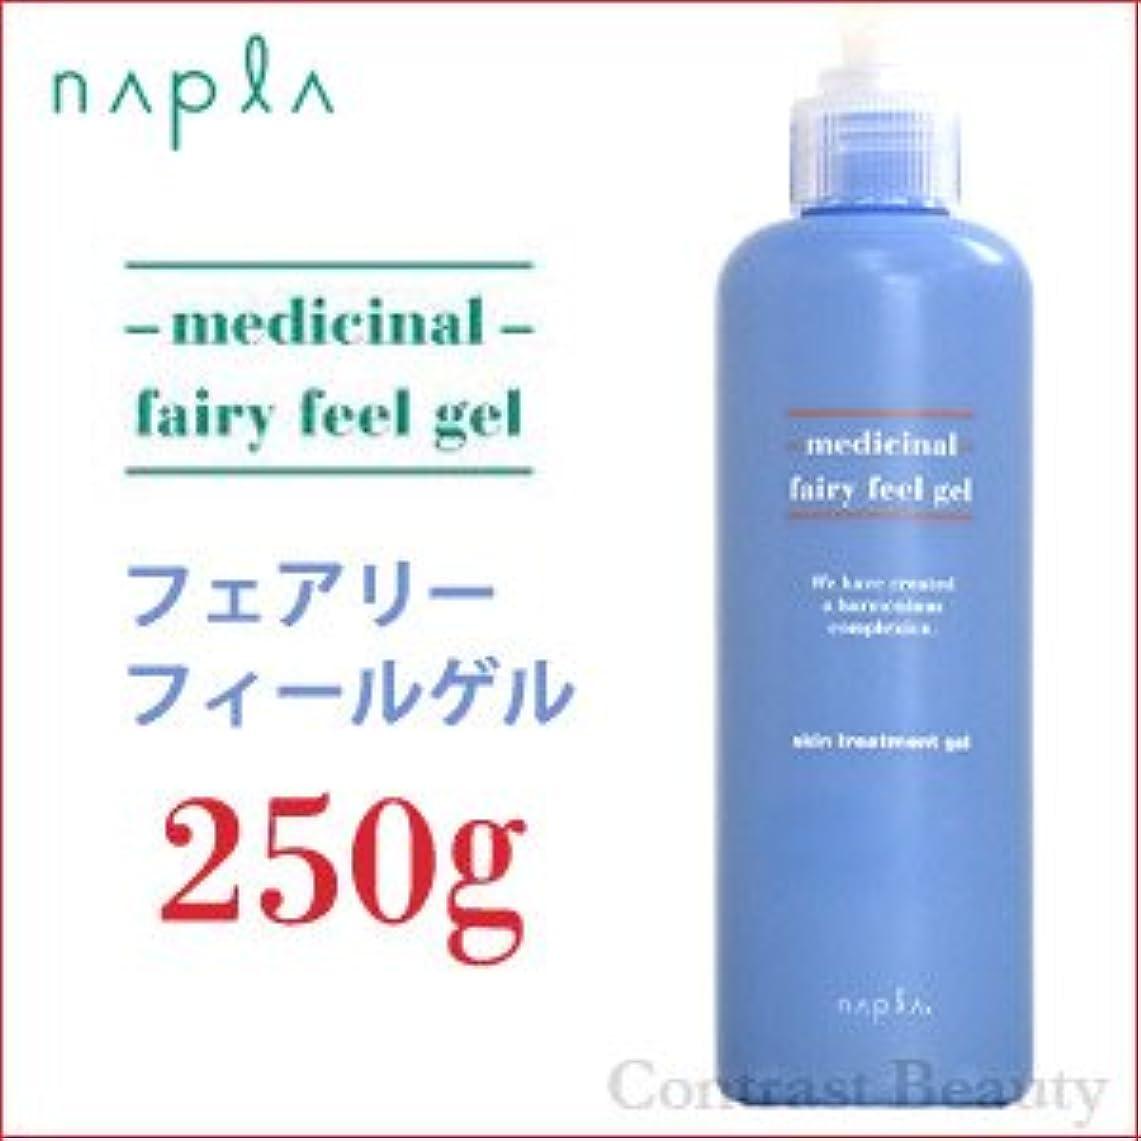 【X5個セット】 ナプラ 薬用フェアリーフィールゲル 250g